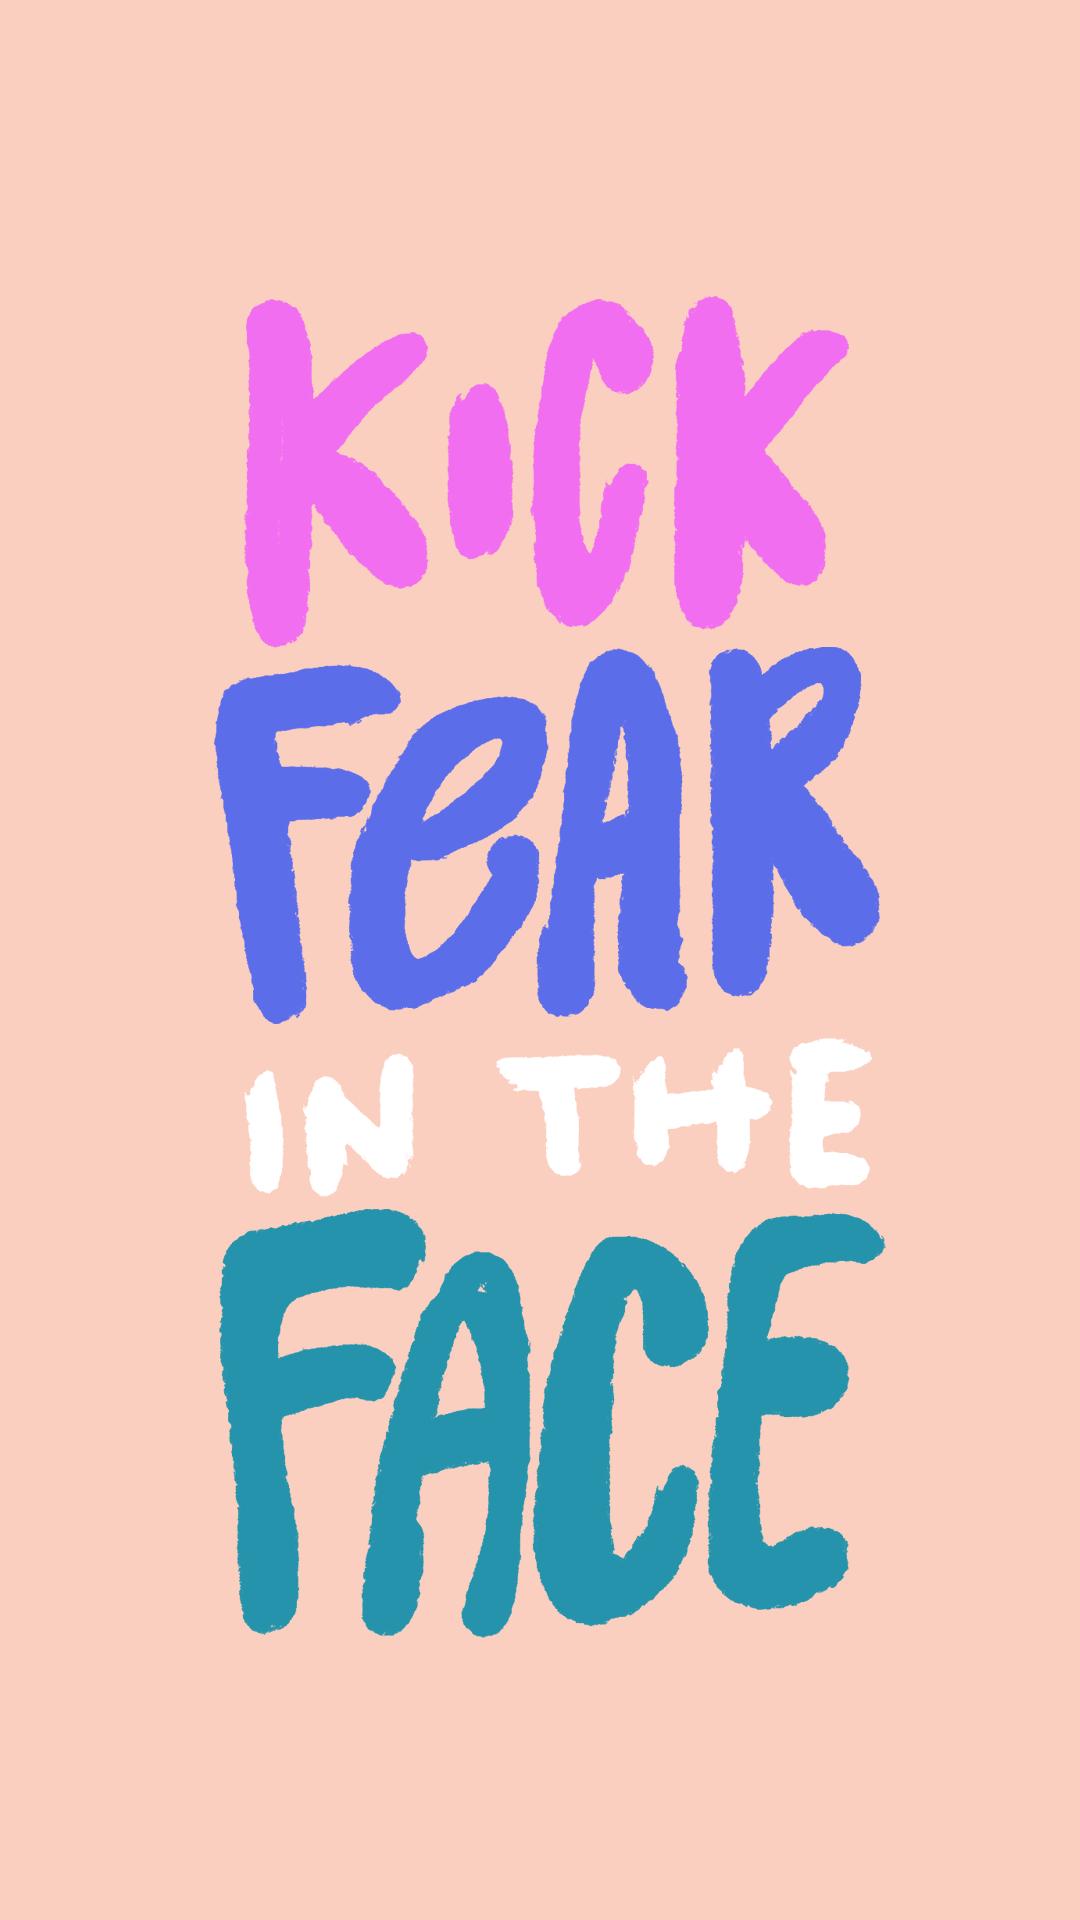 even-vanity-ends-kick-fear-pnk.png